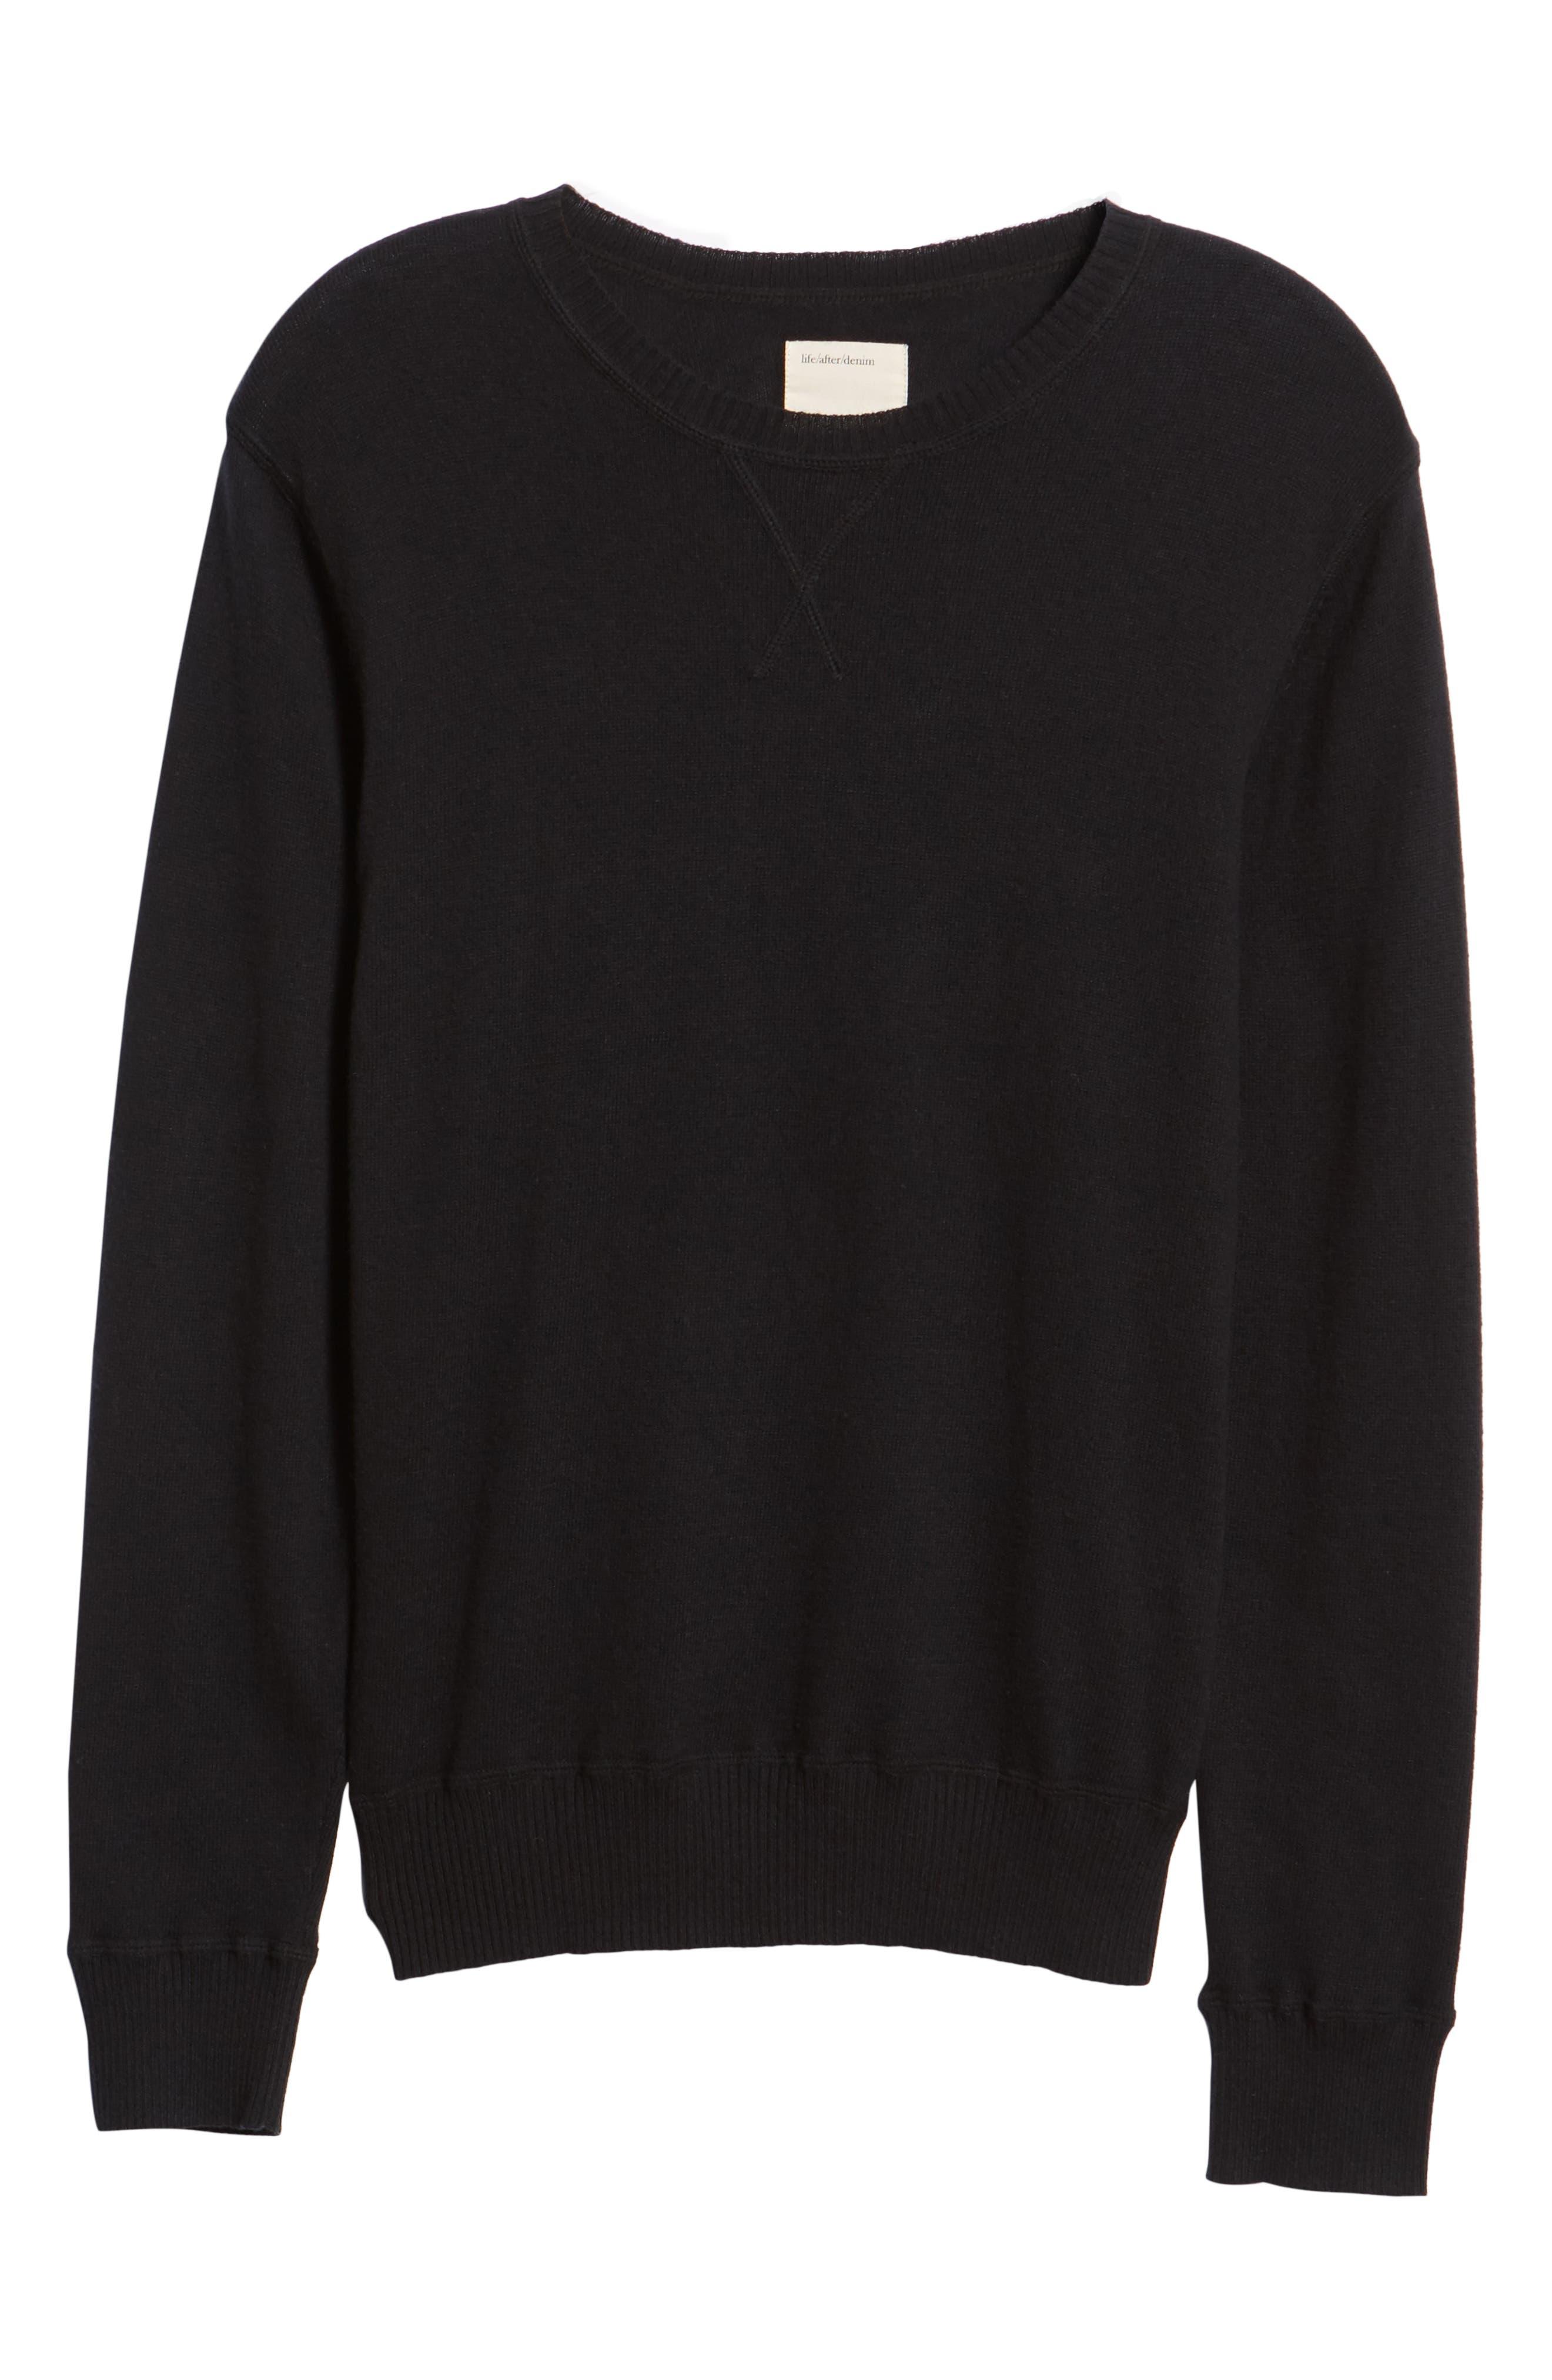 Tournament Slim Fit Crewneck Sweater,                             Alternate thumbnail 6, color,                             BLACK